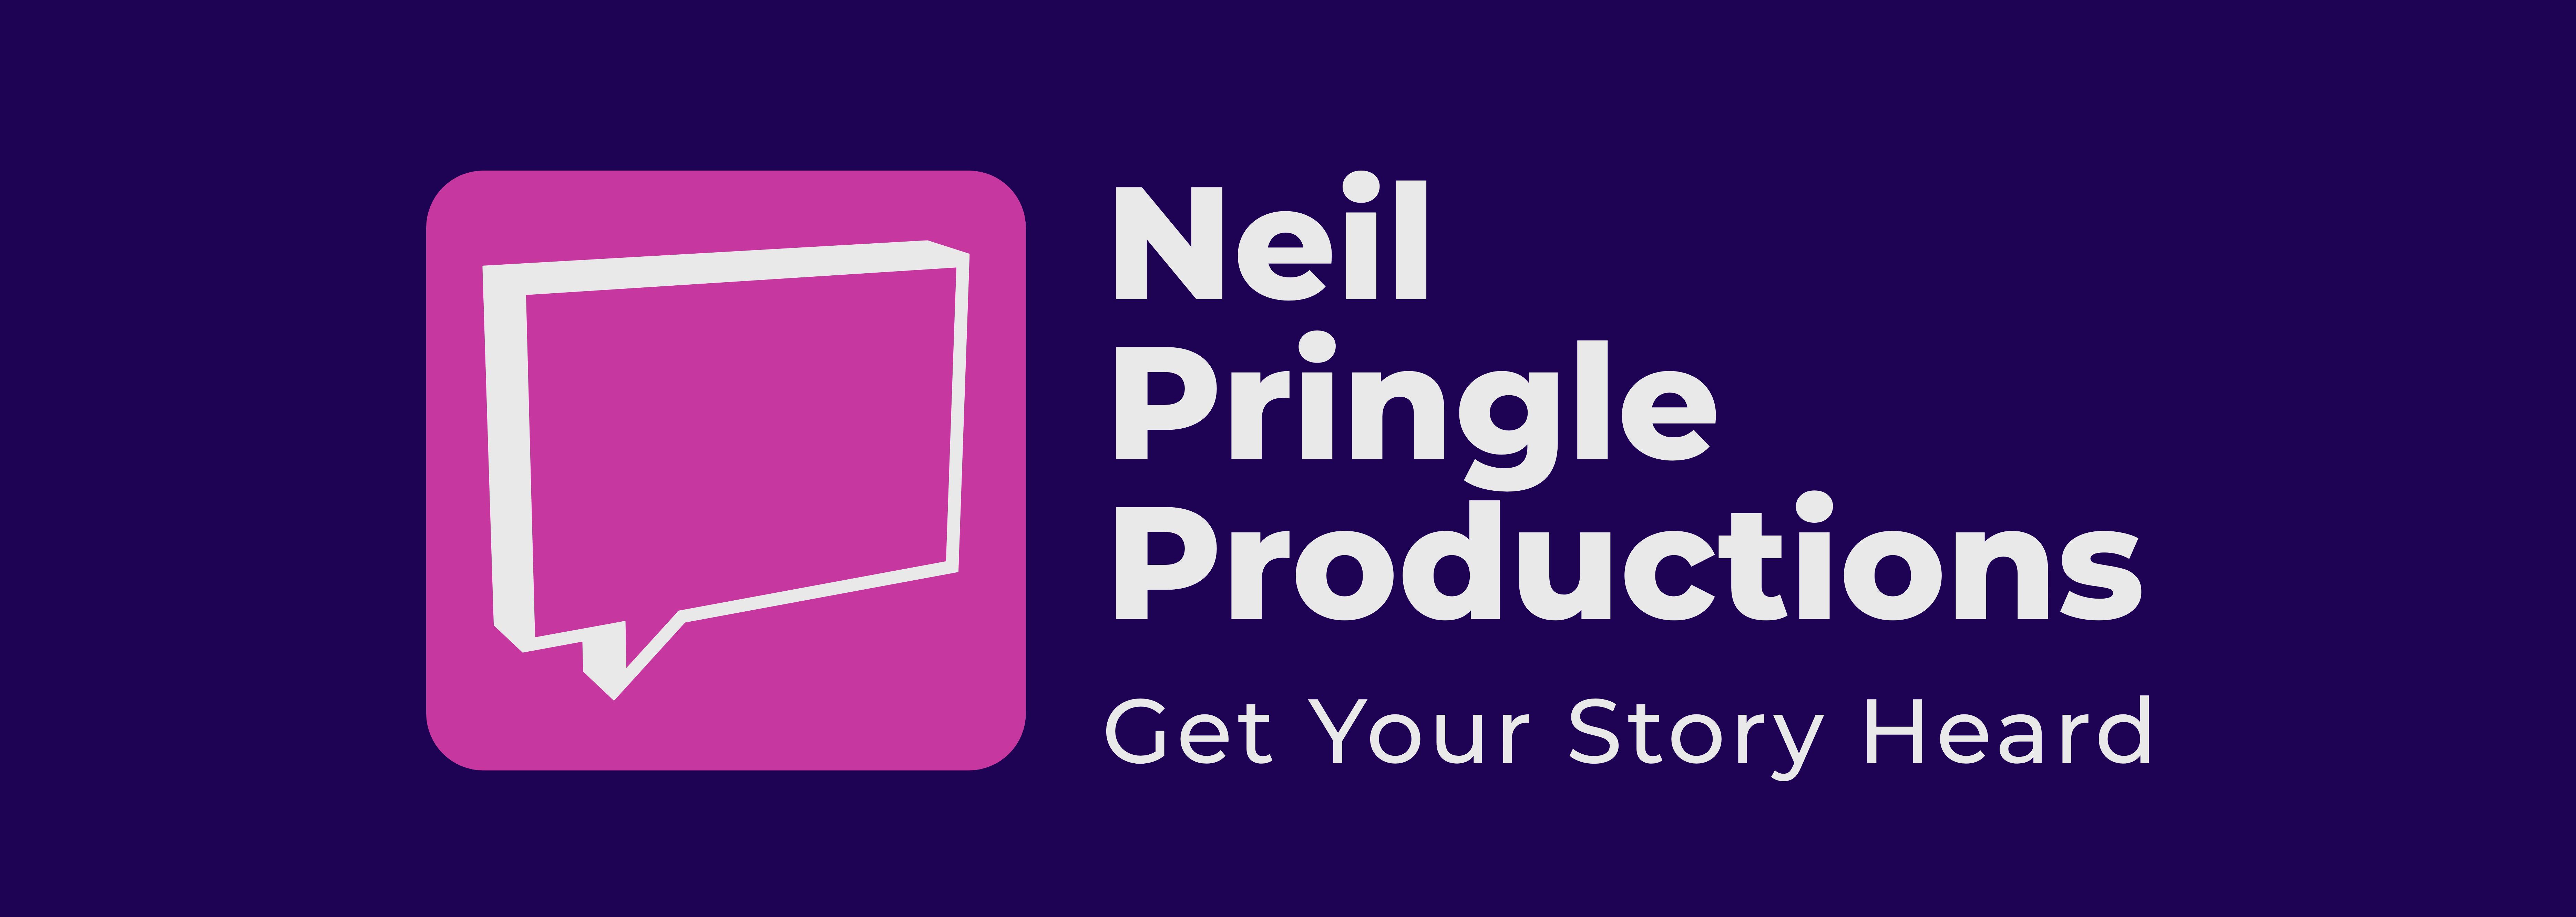 Neil Pringle Productions